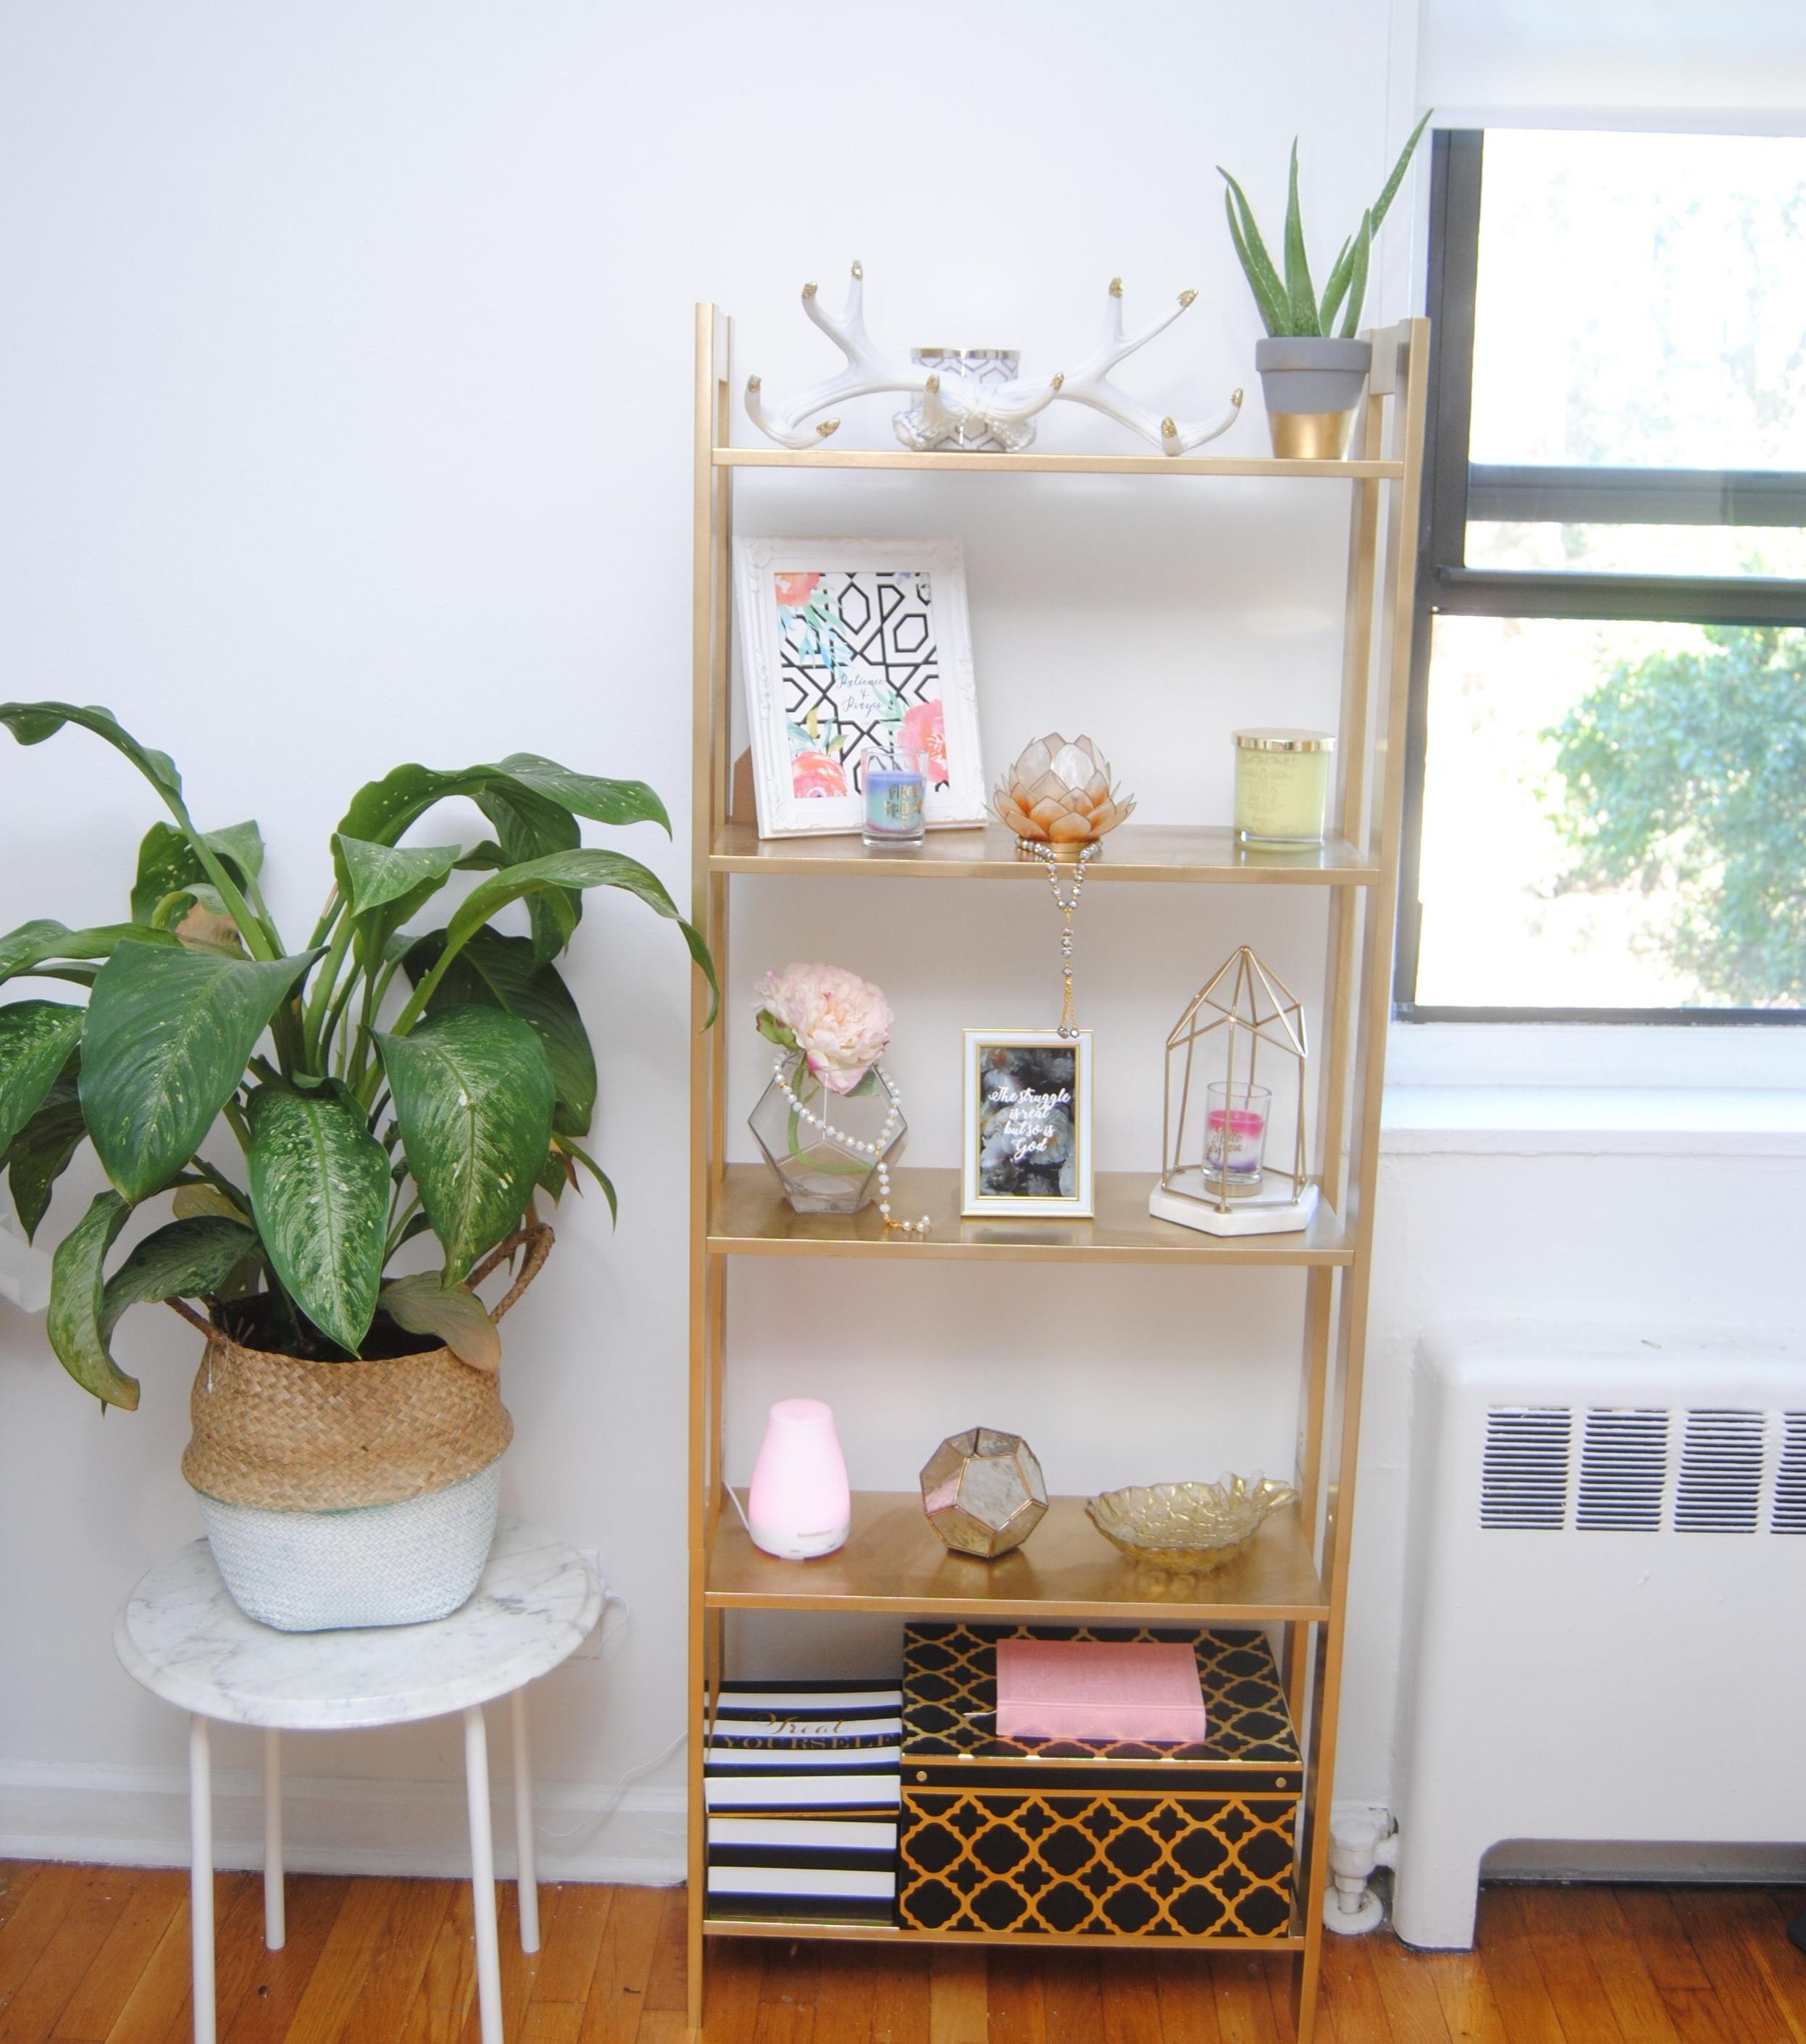 DIY-IKEA-SHELF